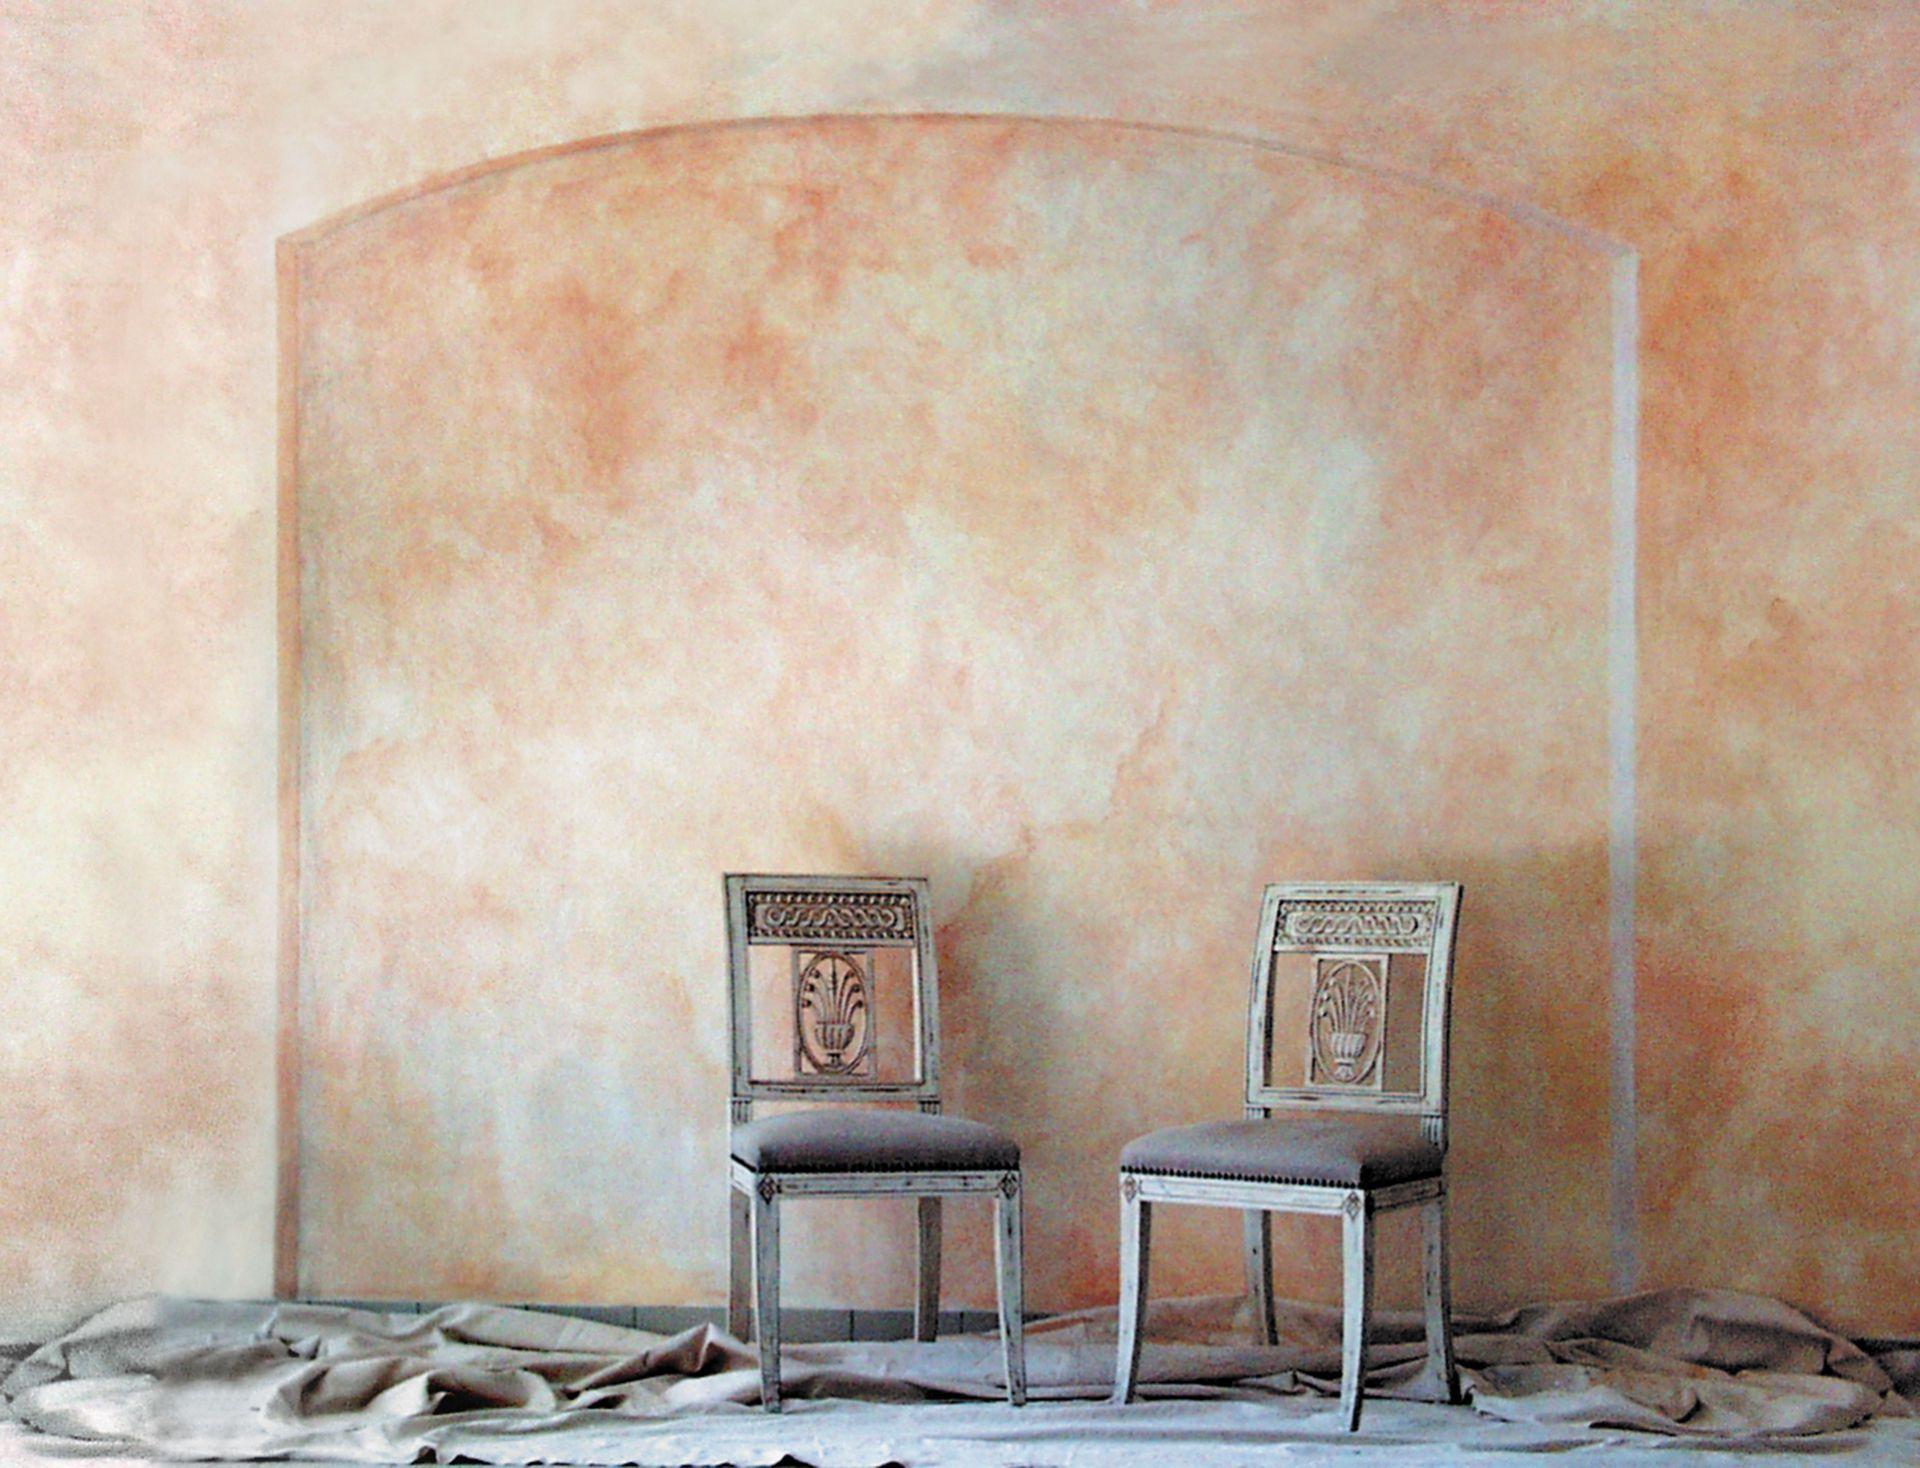 Lasierte wand boden wands modern art workshop studio painting walls step